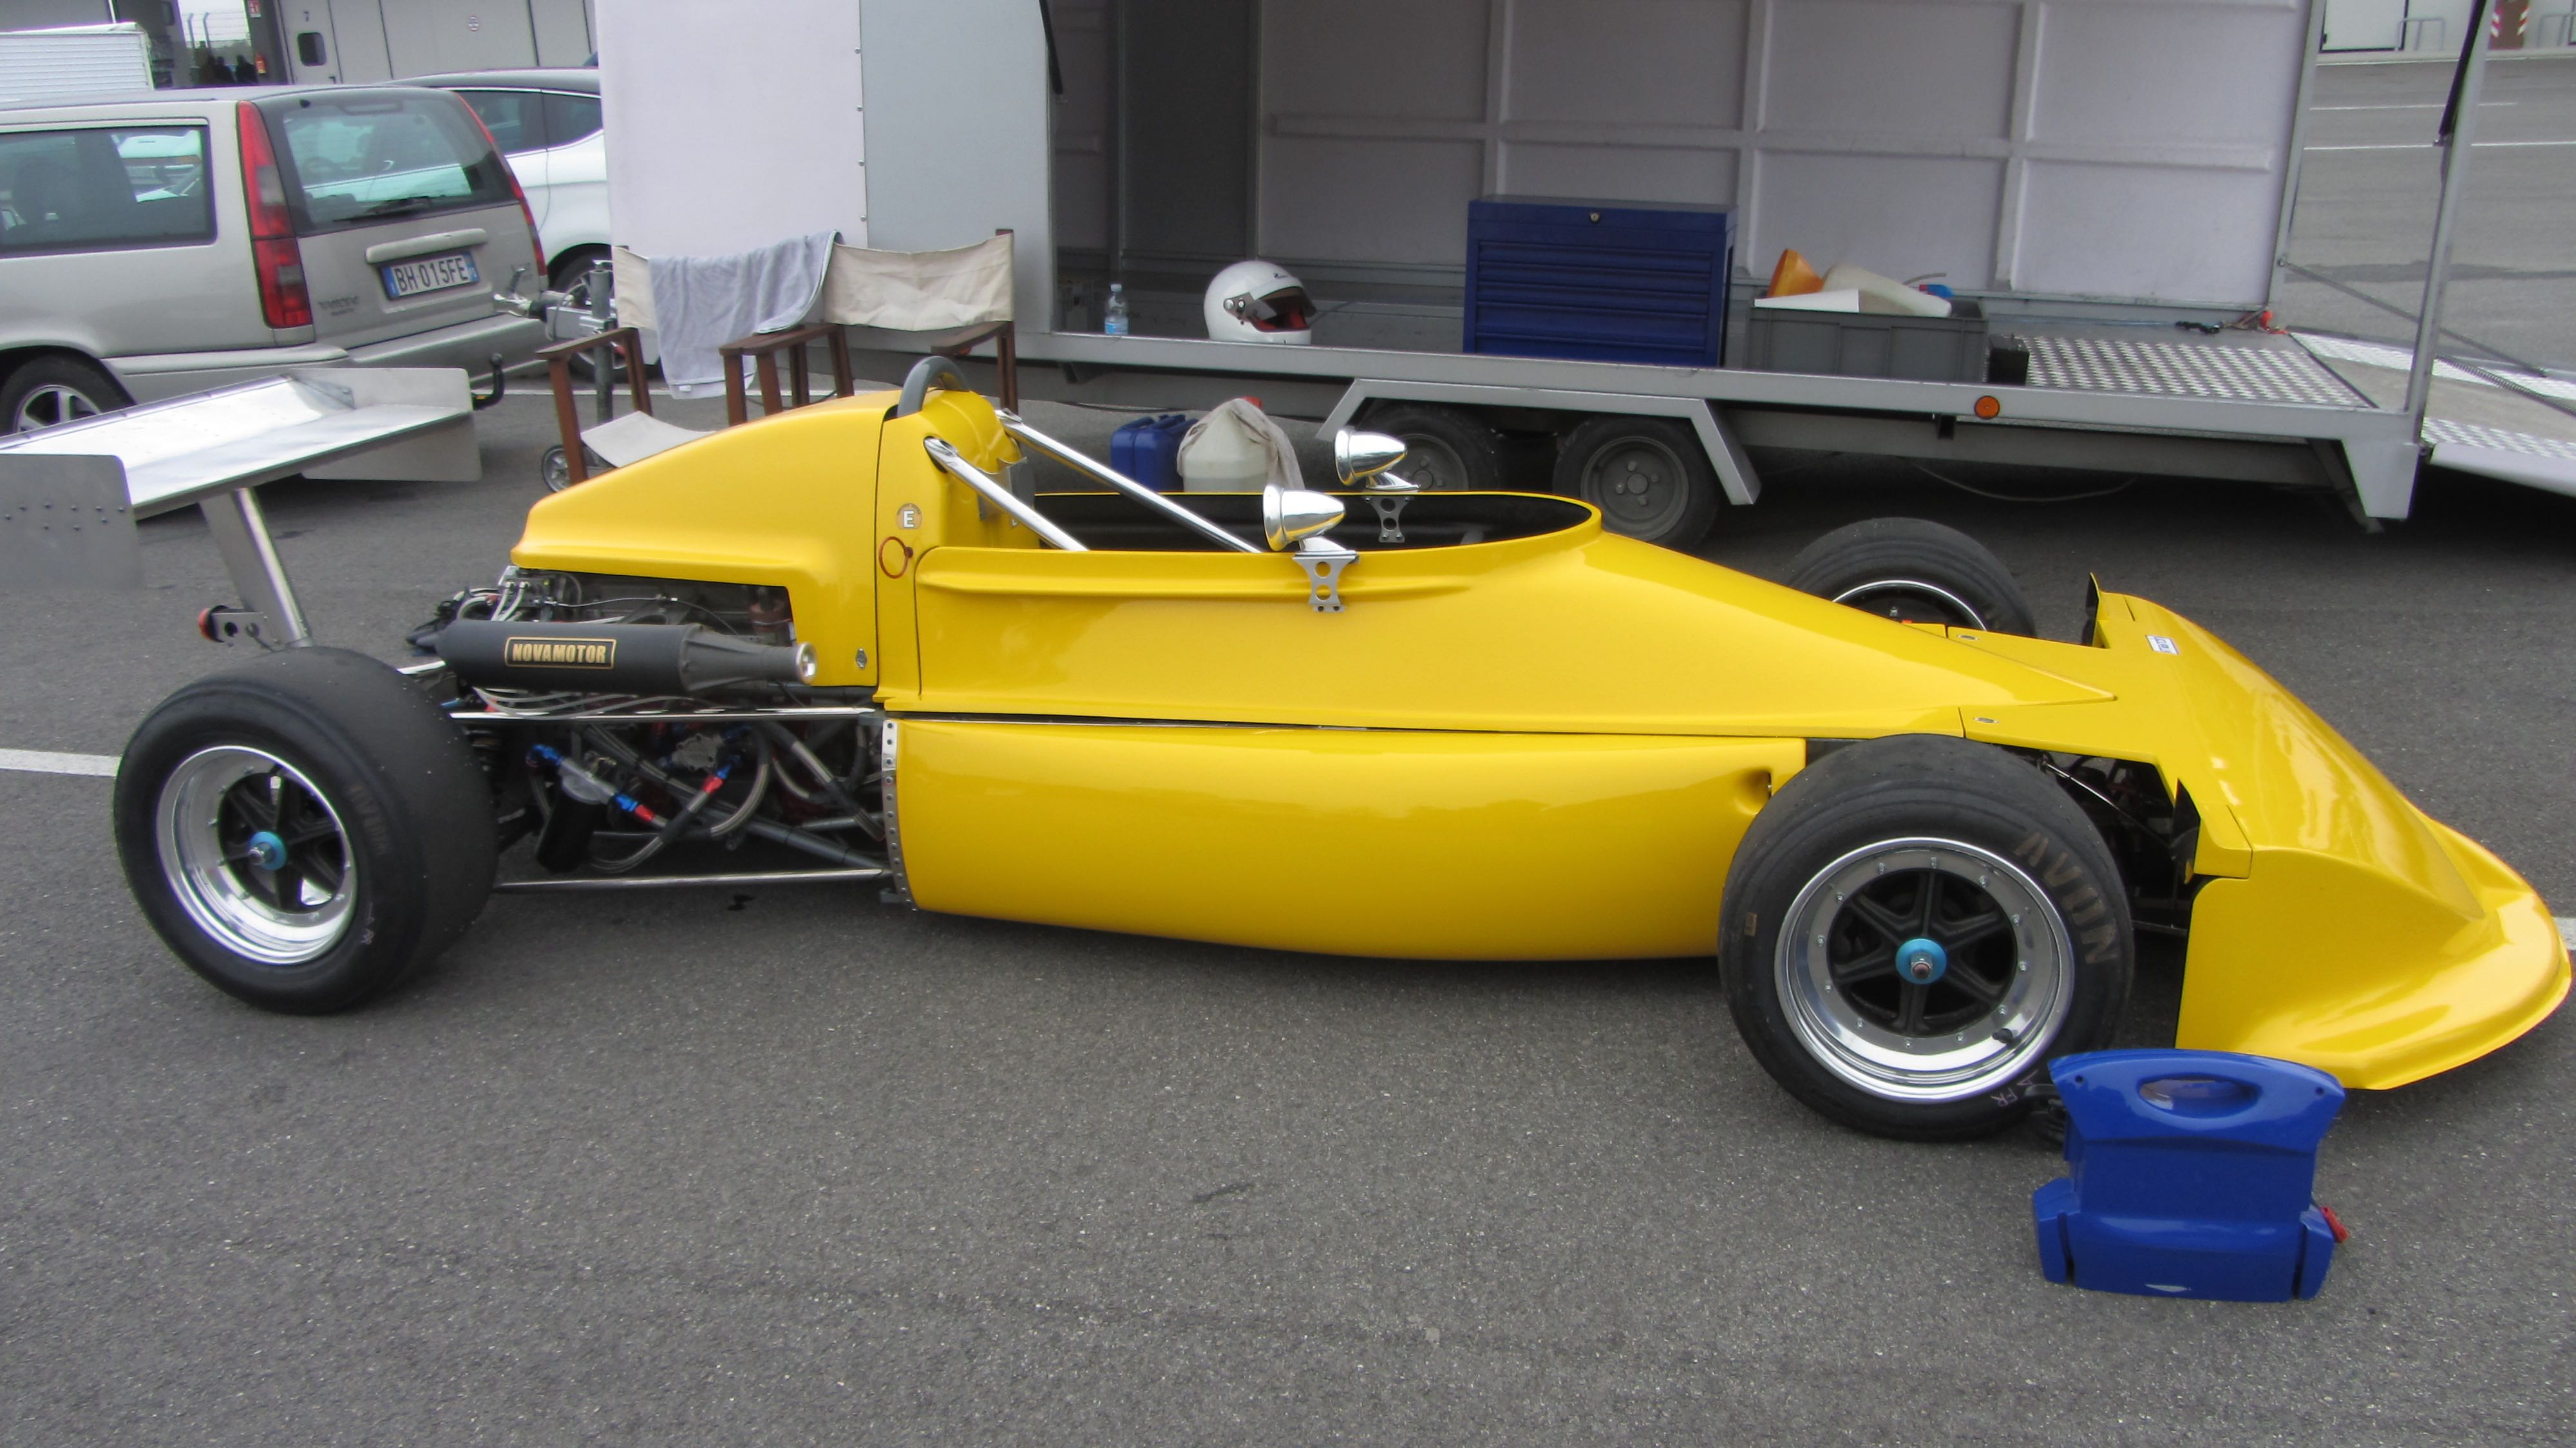 JRGP59